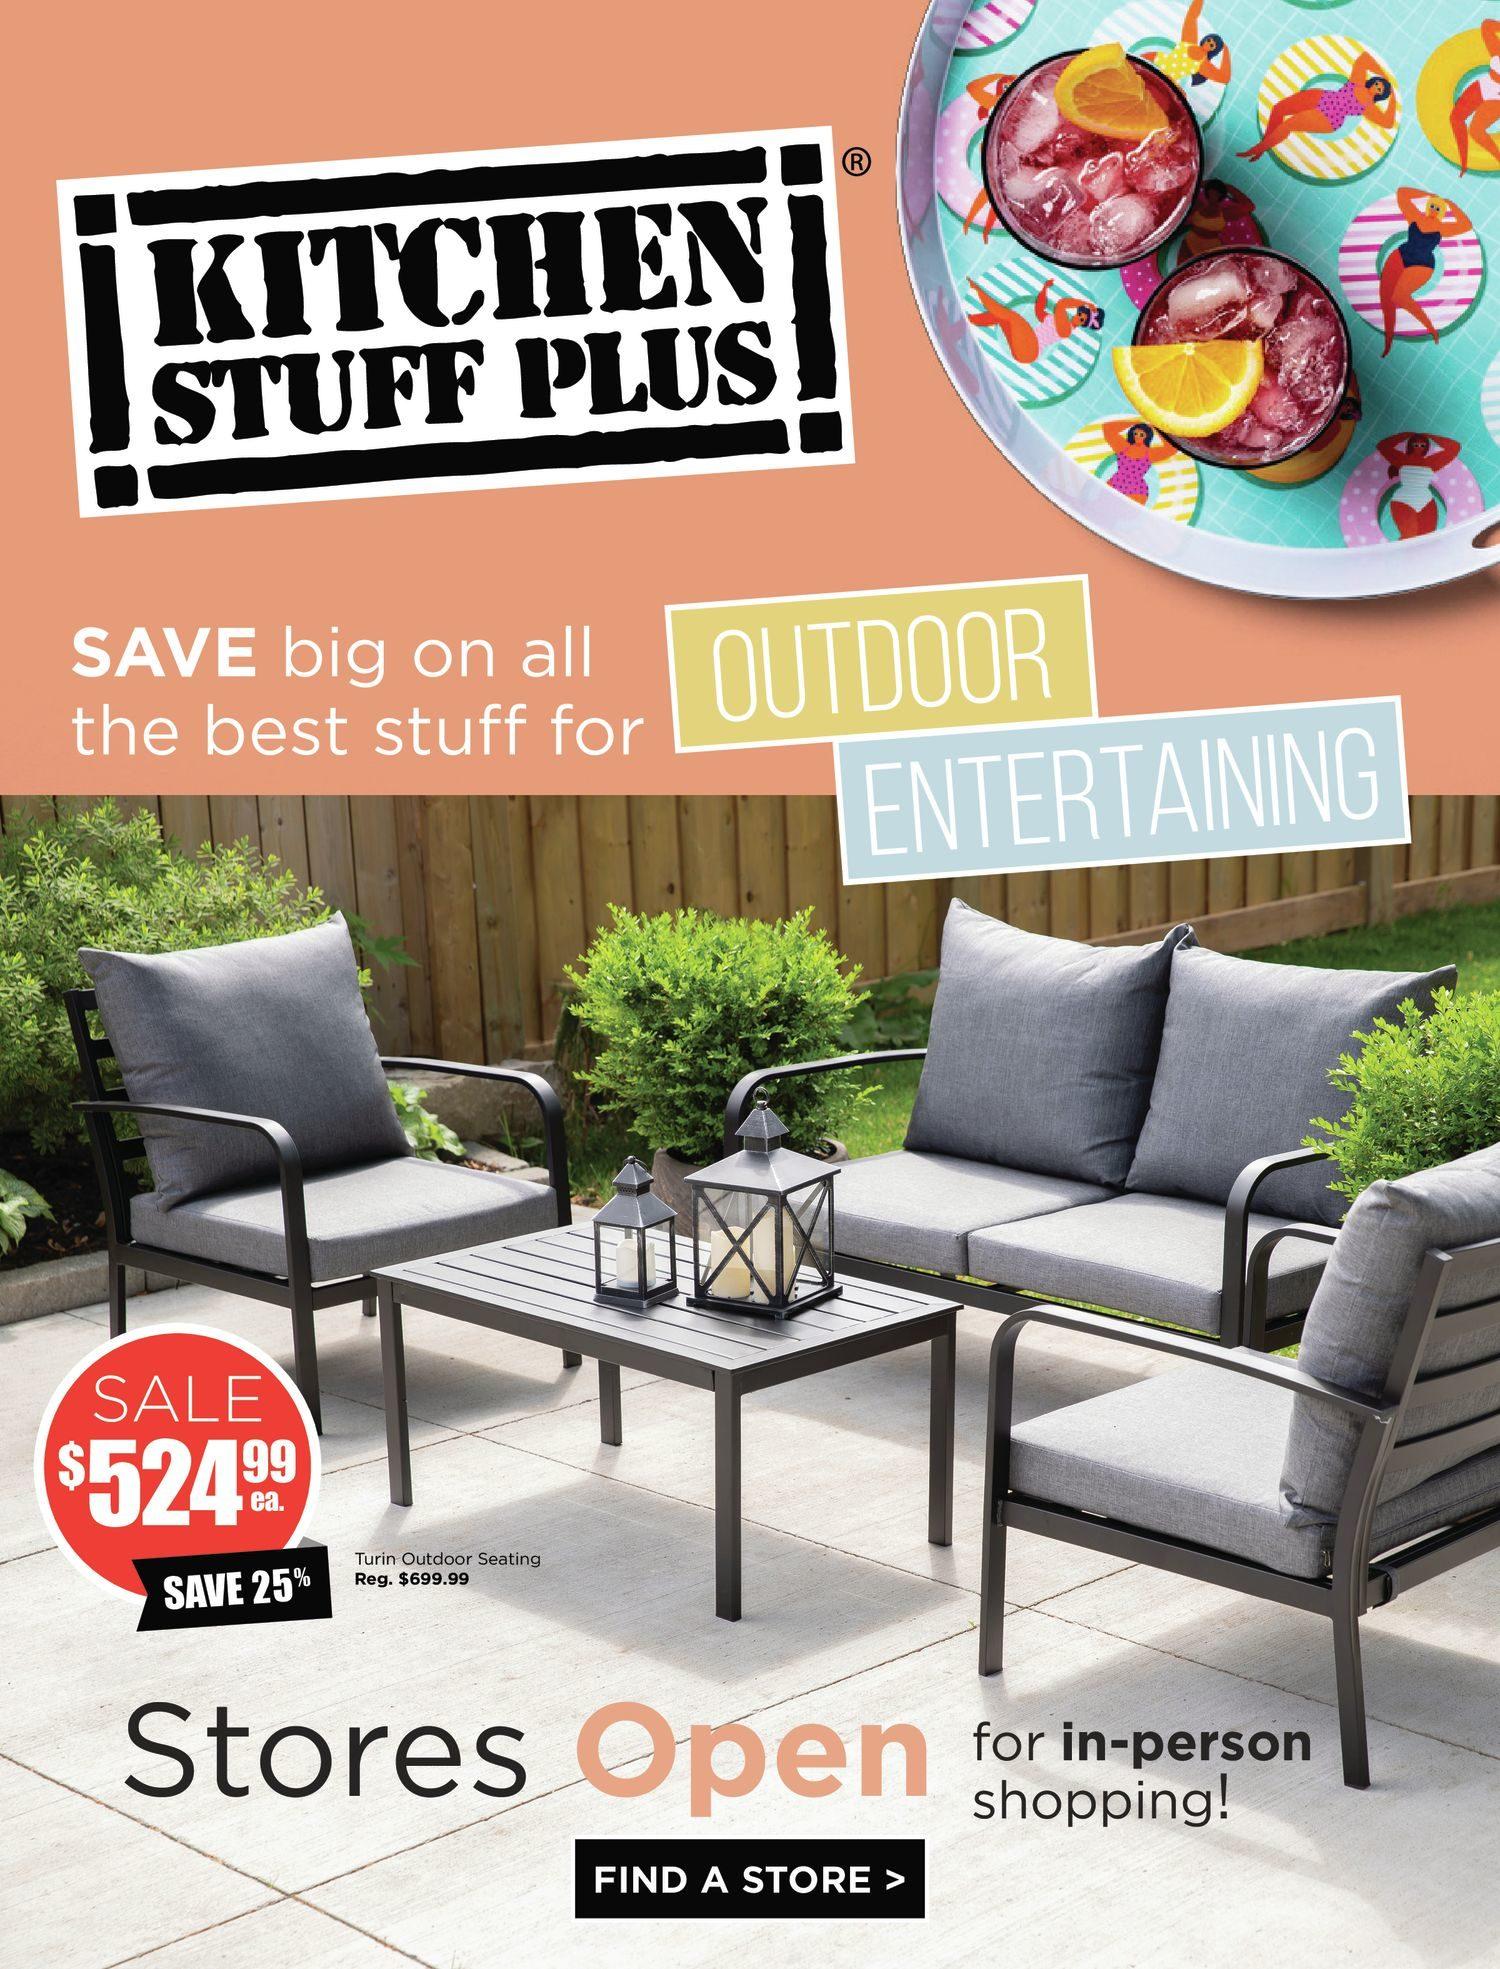 Kitchen Stuff Plus - Outdoor Entertaining Event